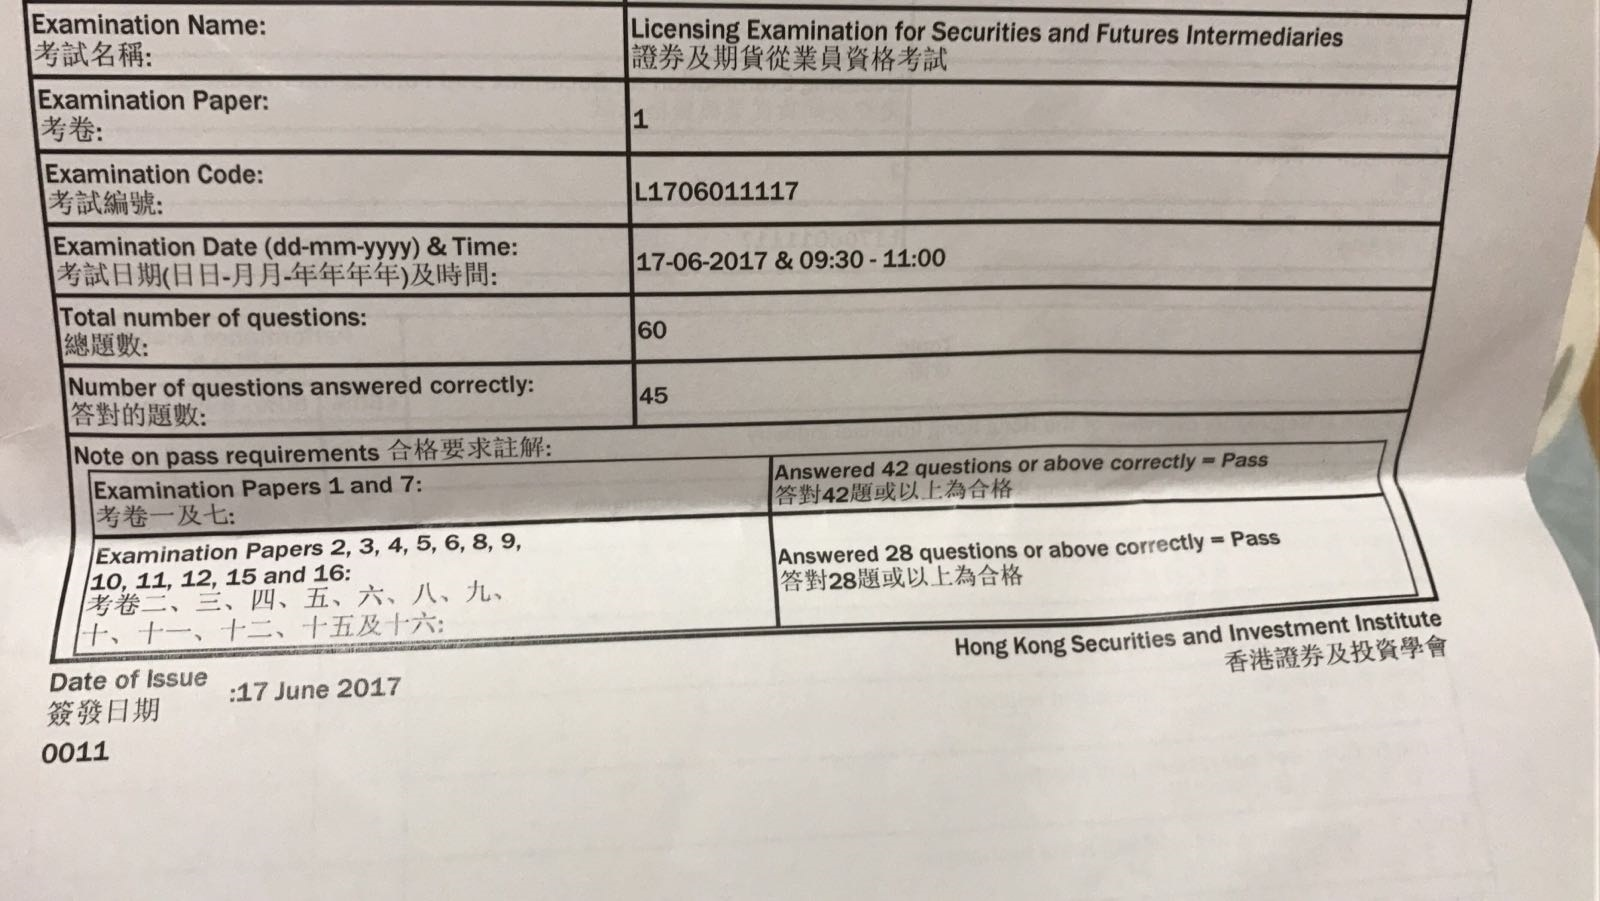 MHC 17/6/2017 LE Paper 1 證券期貨從業員資格考試卷一 Pass